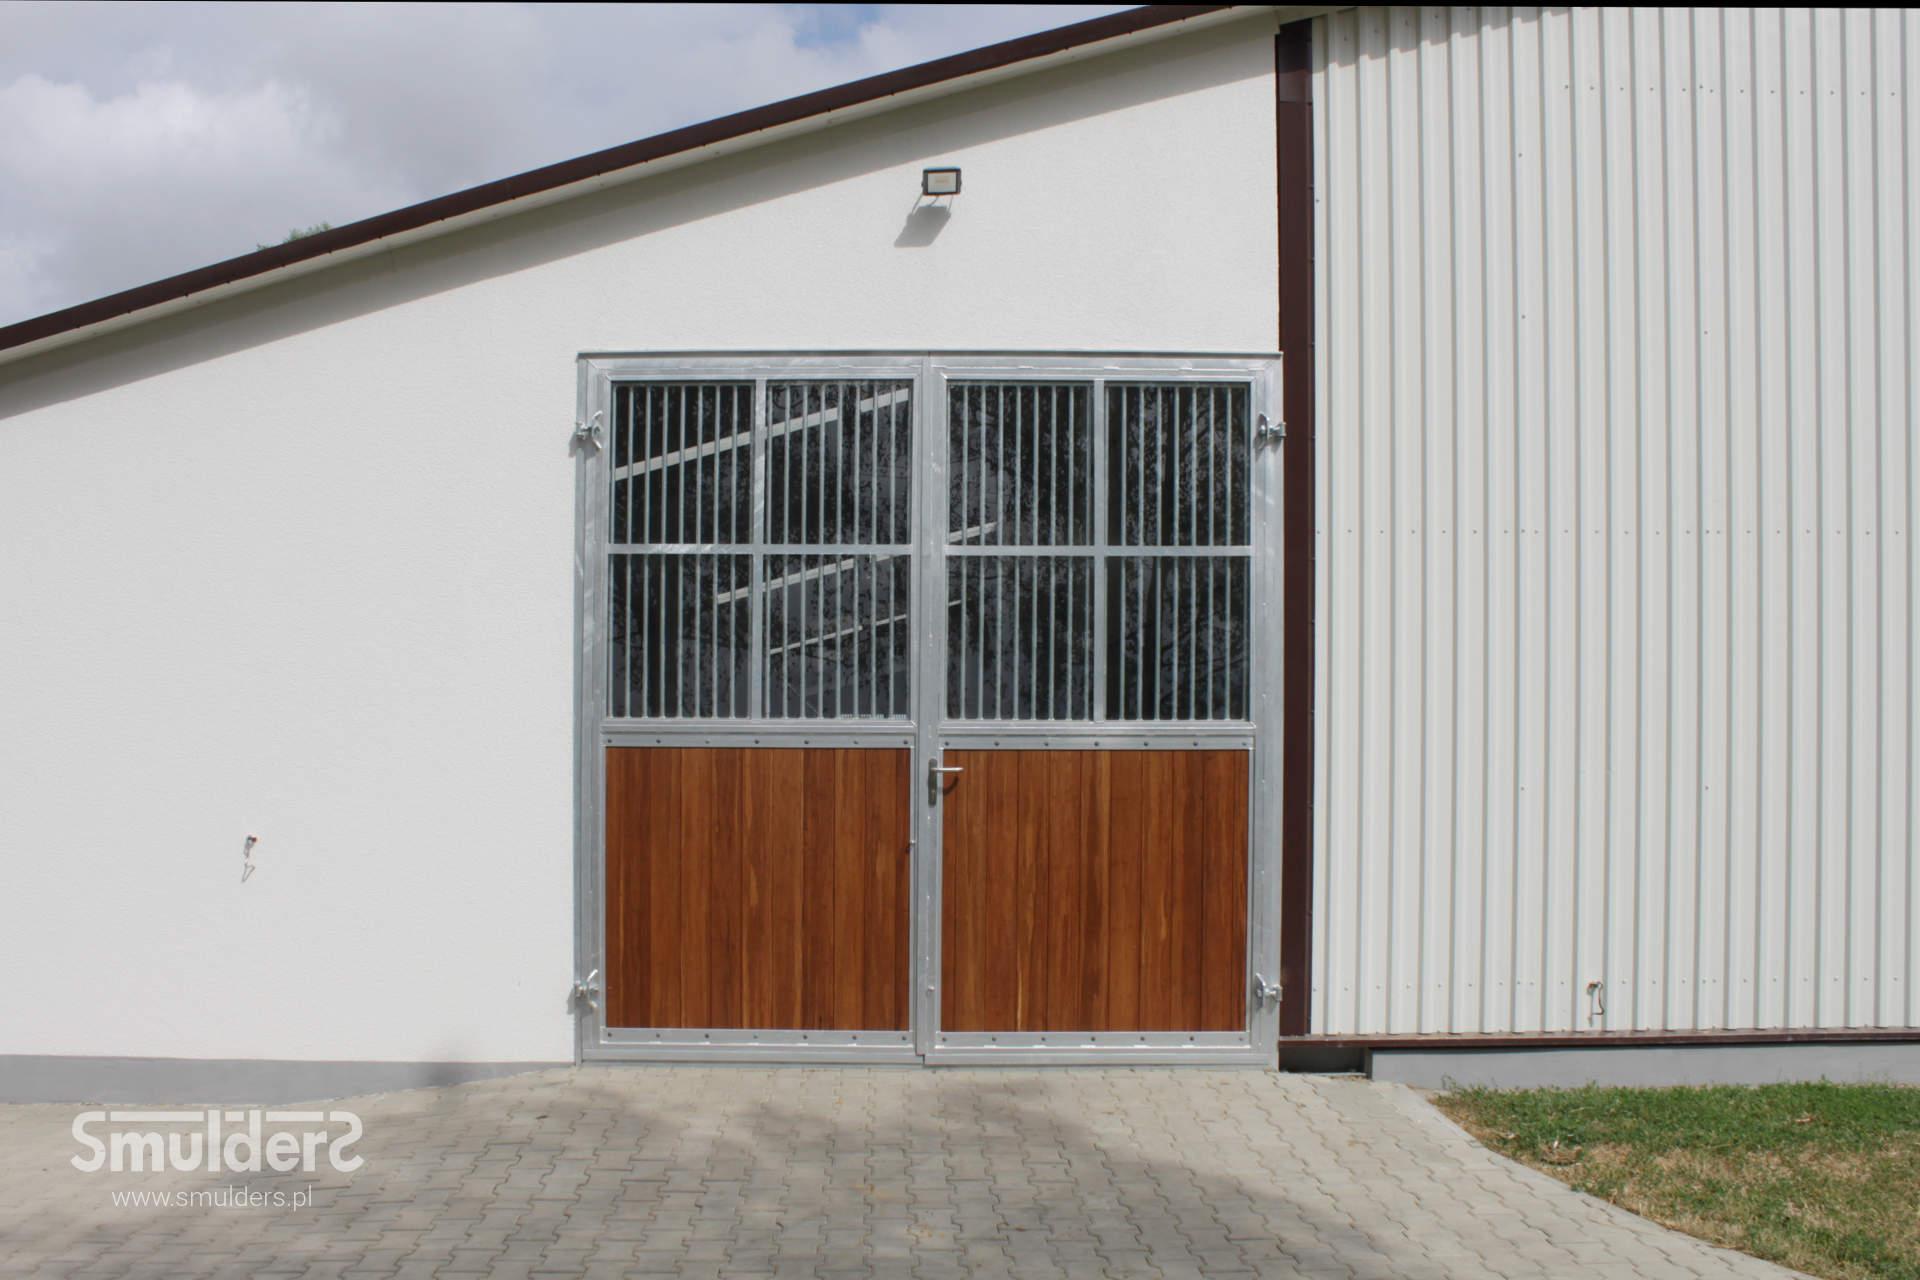 http://www.smulders.pl/wp-content/uploads/2019/07/f011_barn-door_SW_SMULDERS_PL.jpg